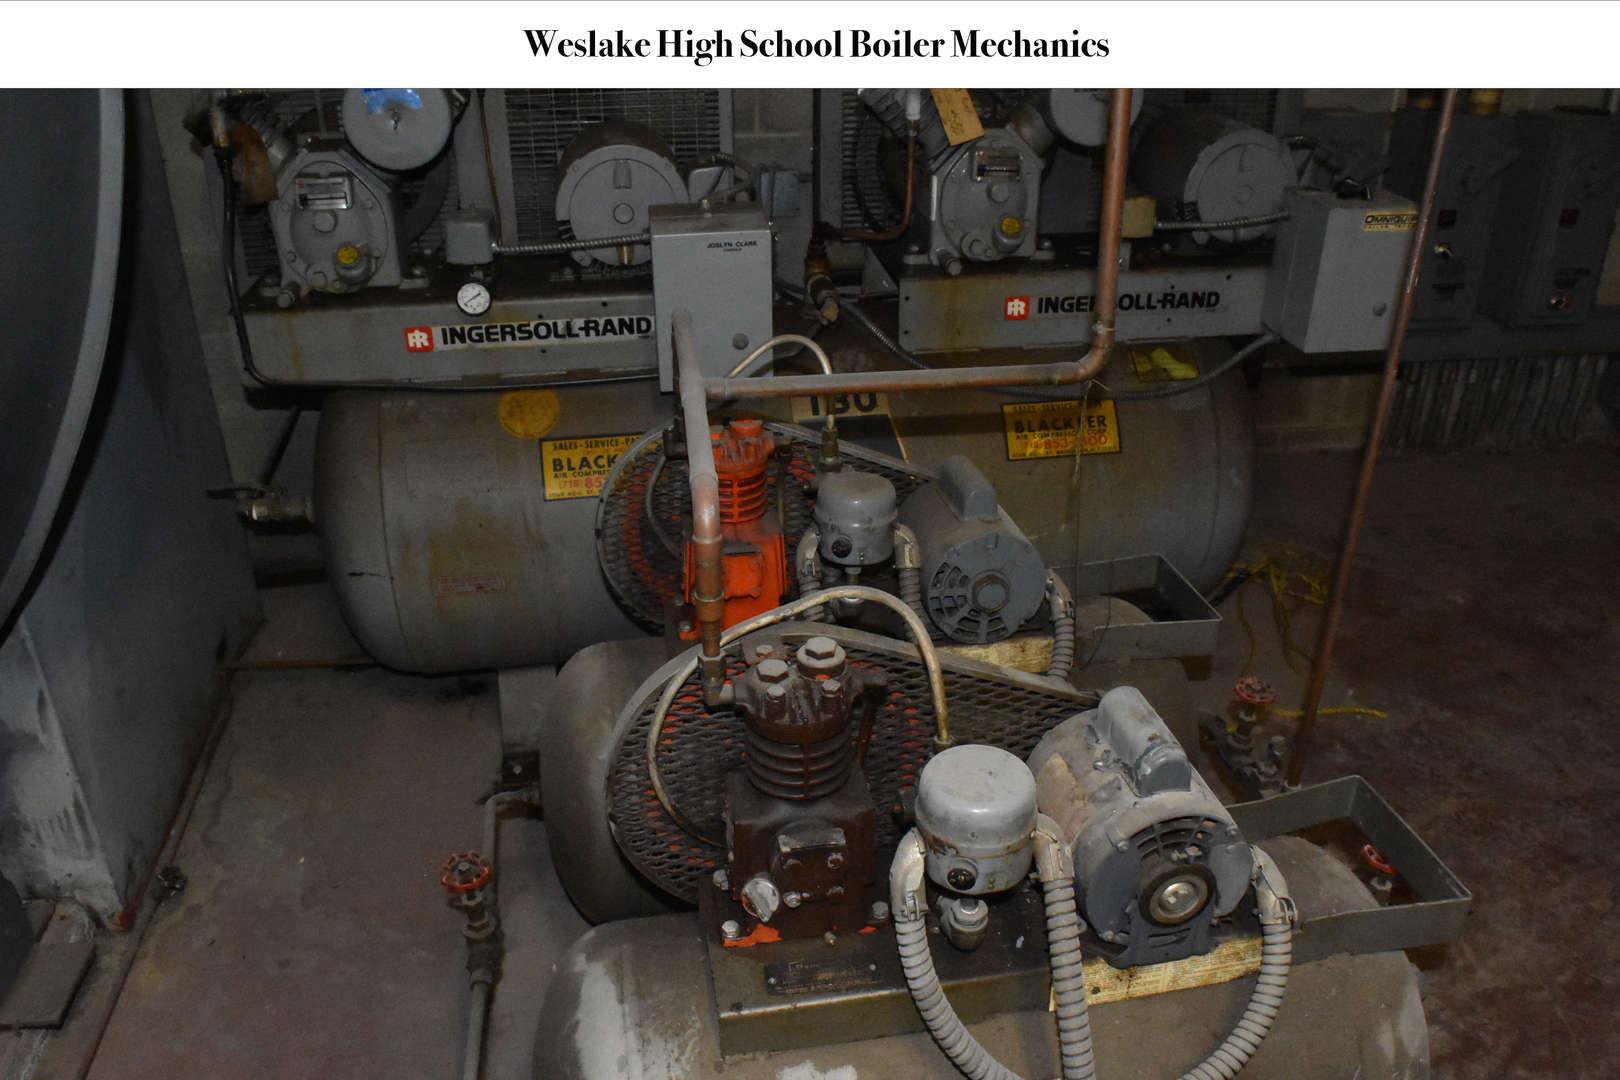 WHS Boiler Room Mechanical Unit